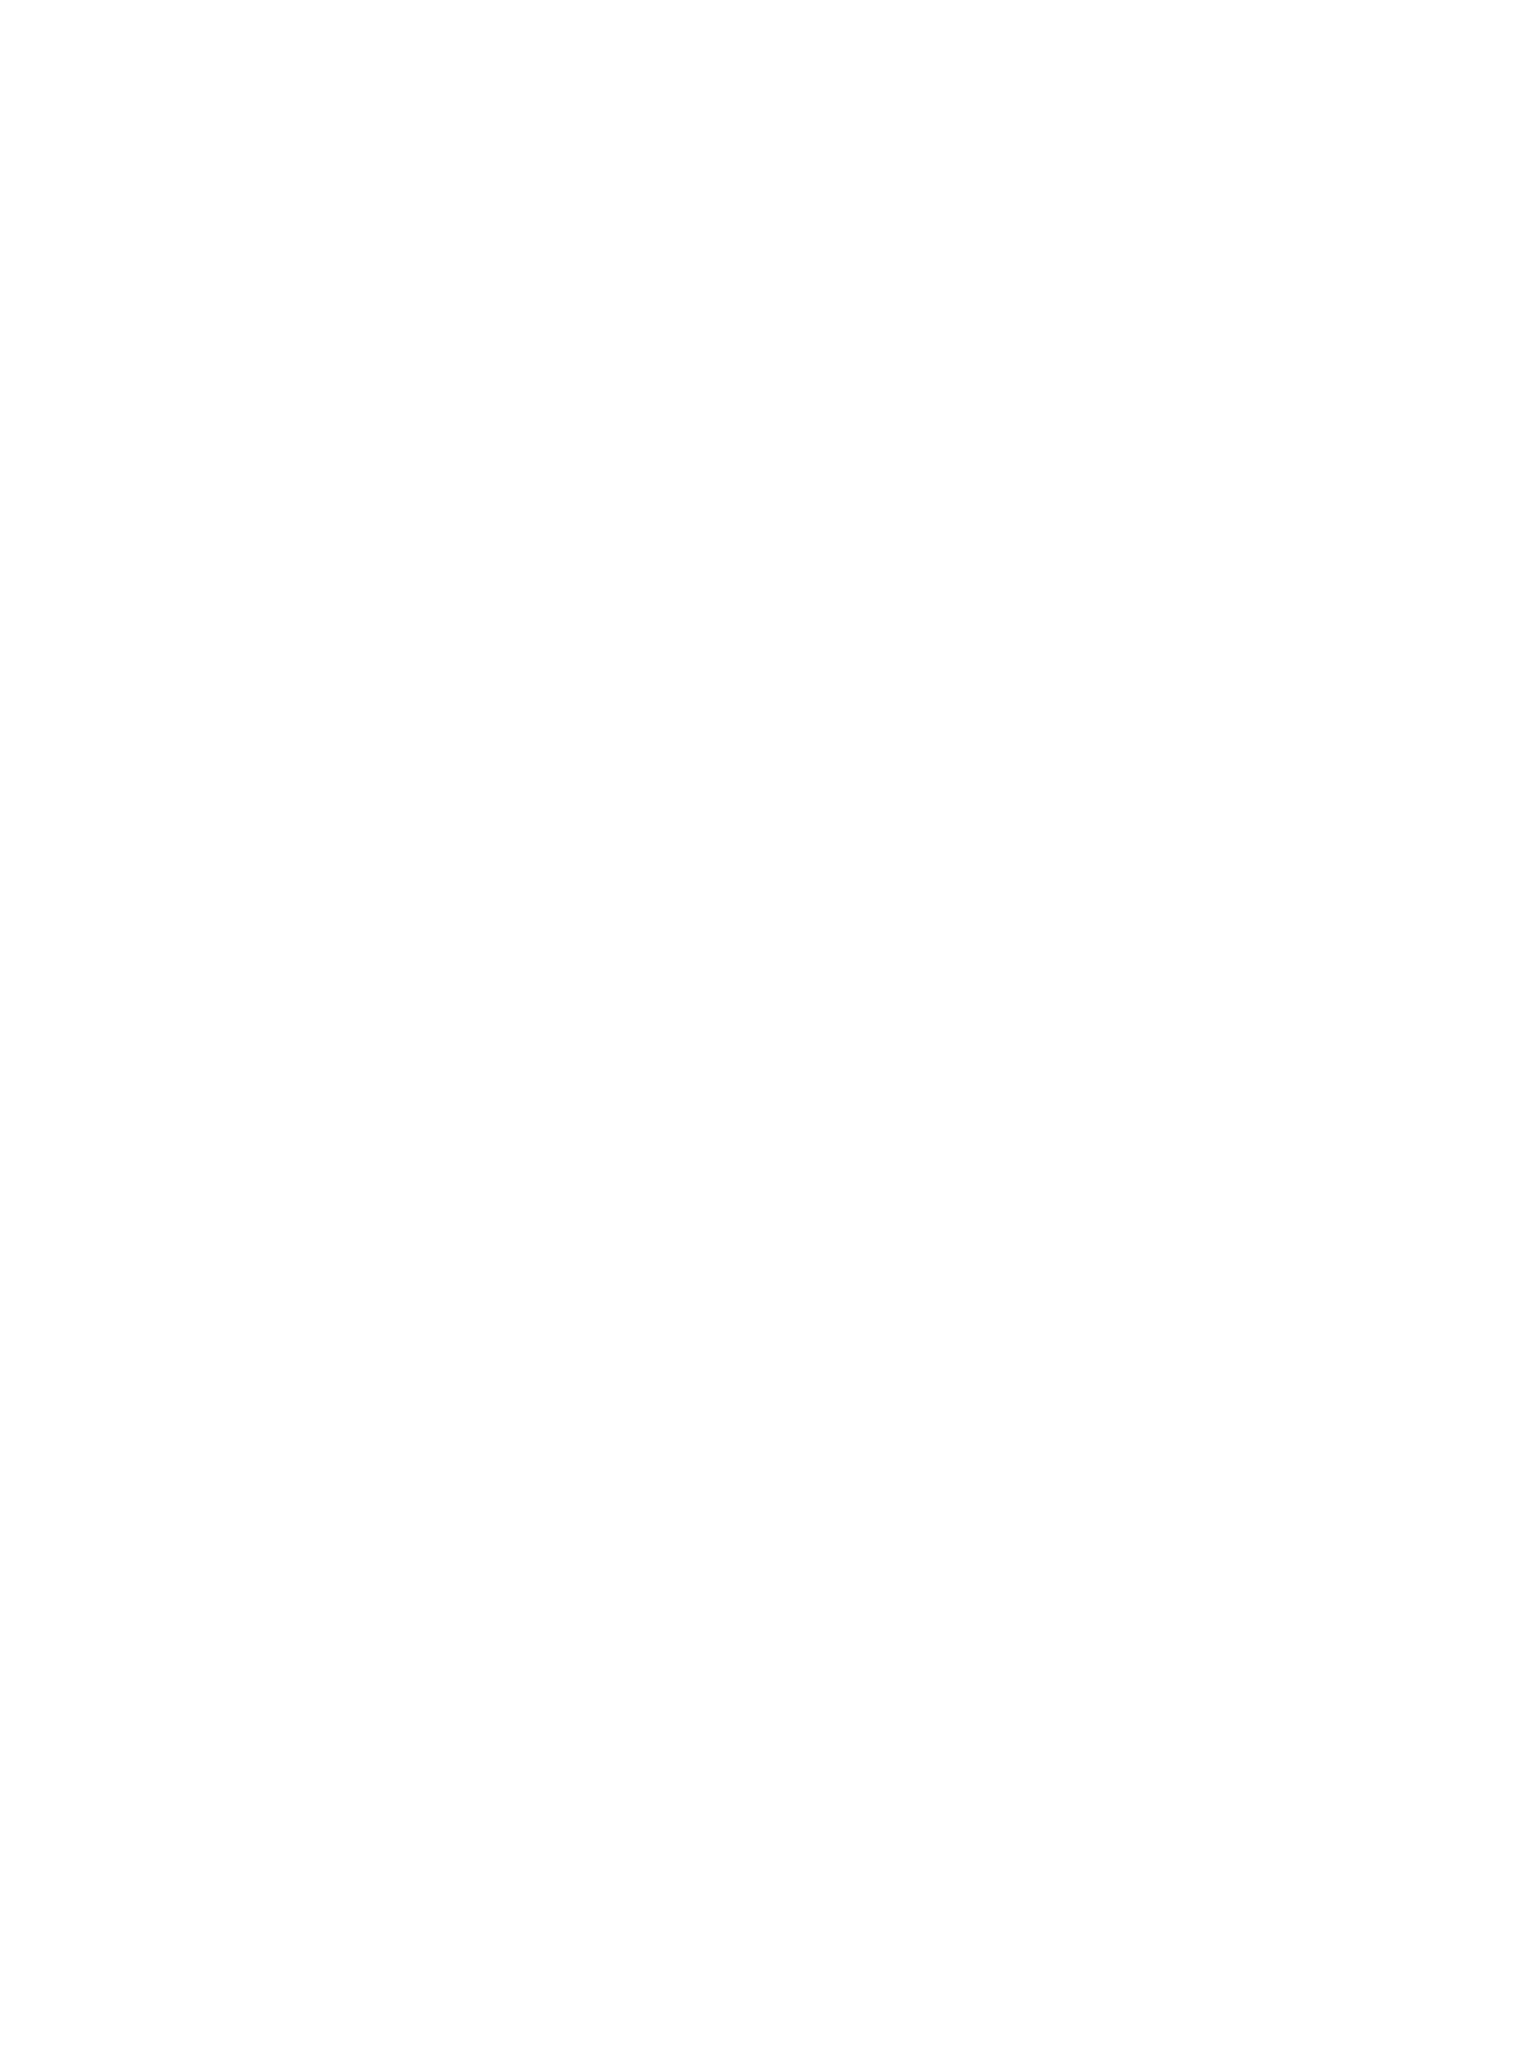 Iphoneの画面焼き付きが出たときの対処 真っ白画像つき Wryoku